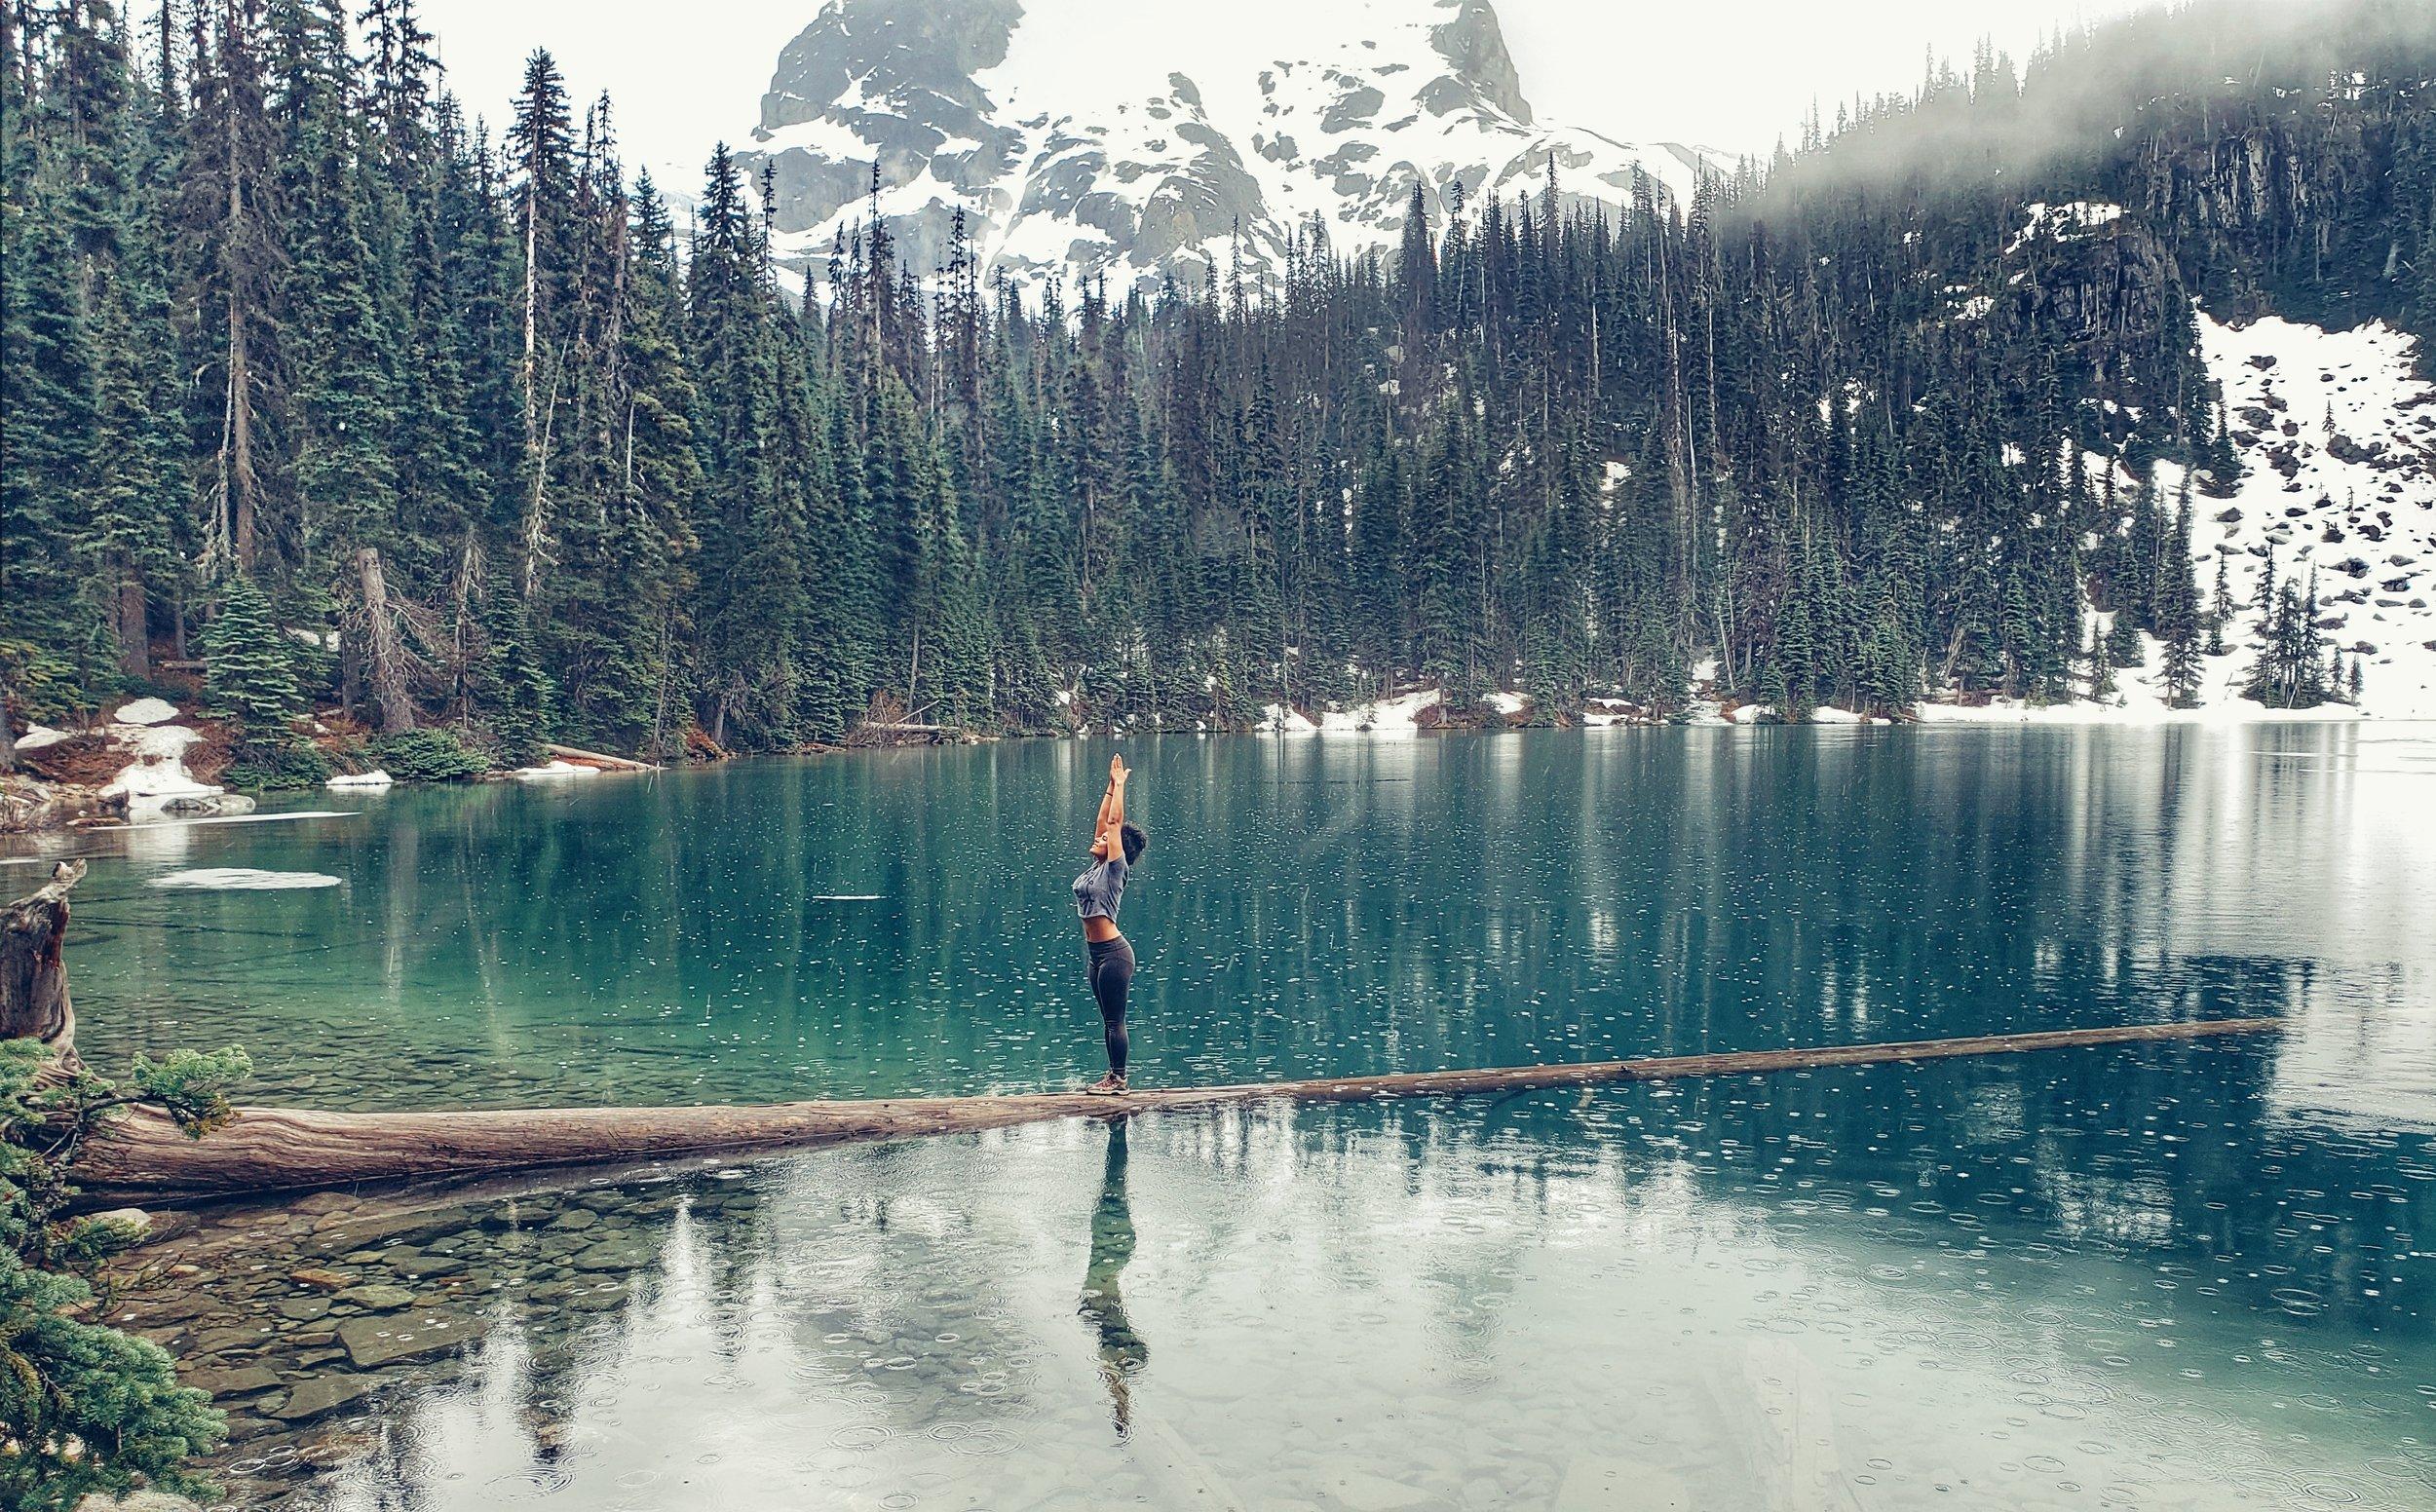 How to achieve work-life balance